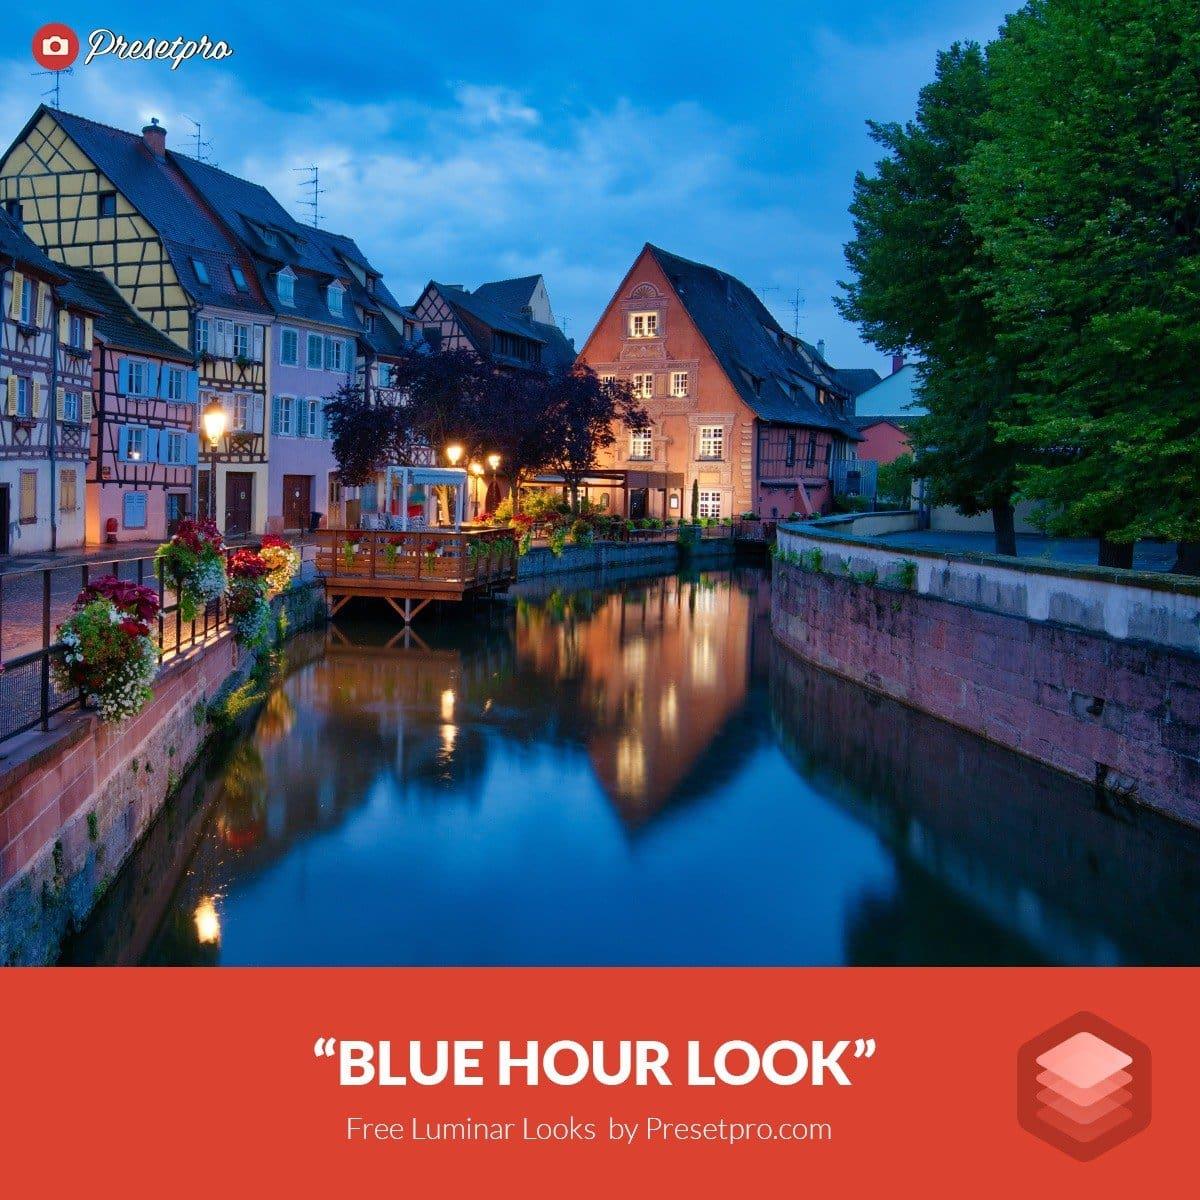 Free-Luminar-Look-Preset-Blue-Hour-Presetpro.com